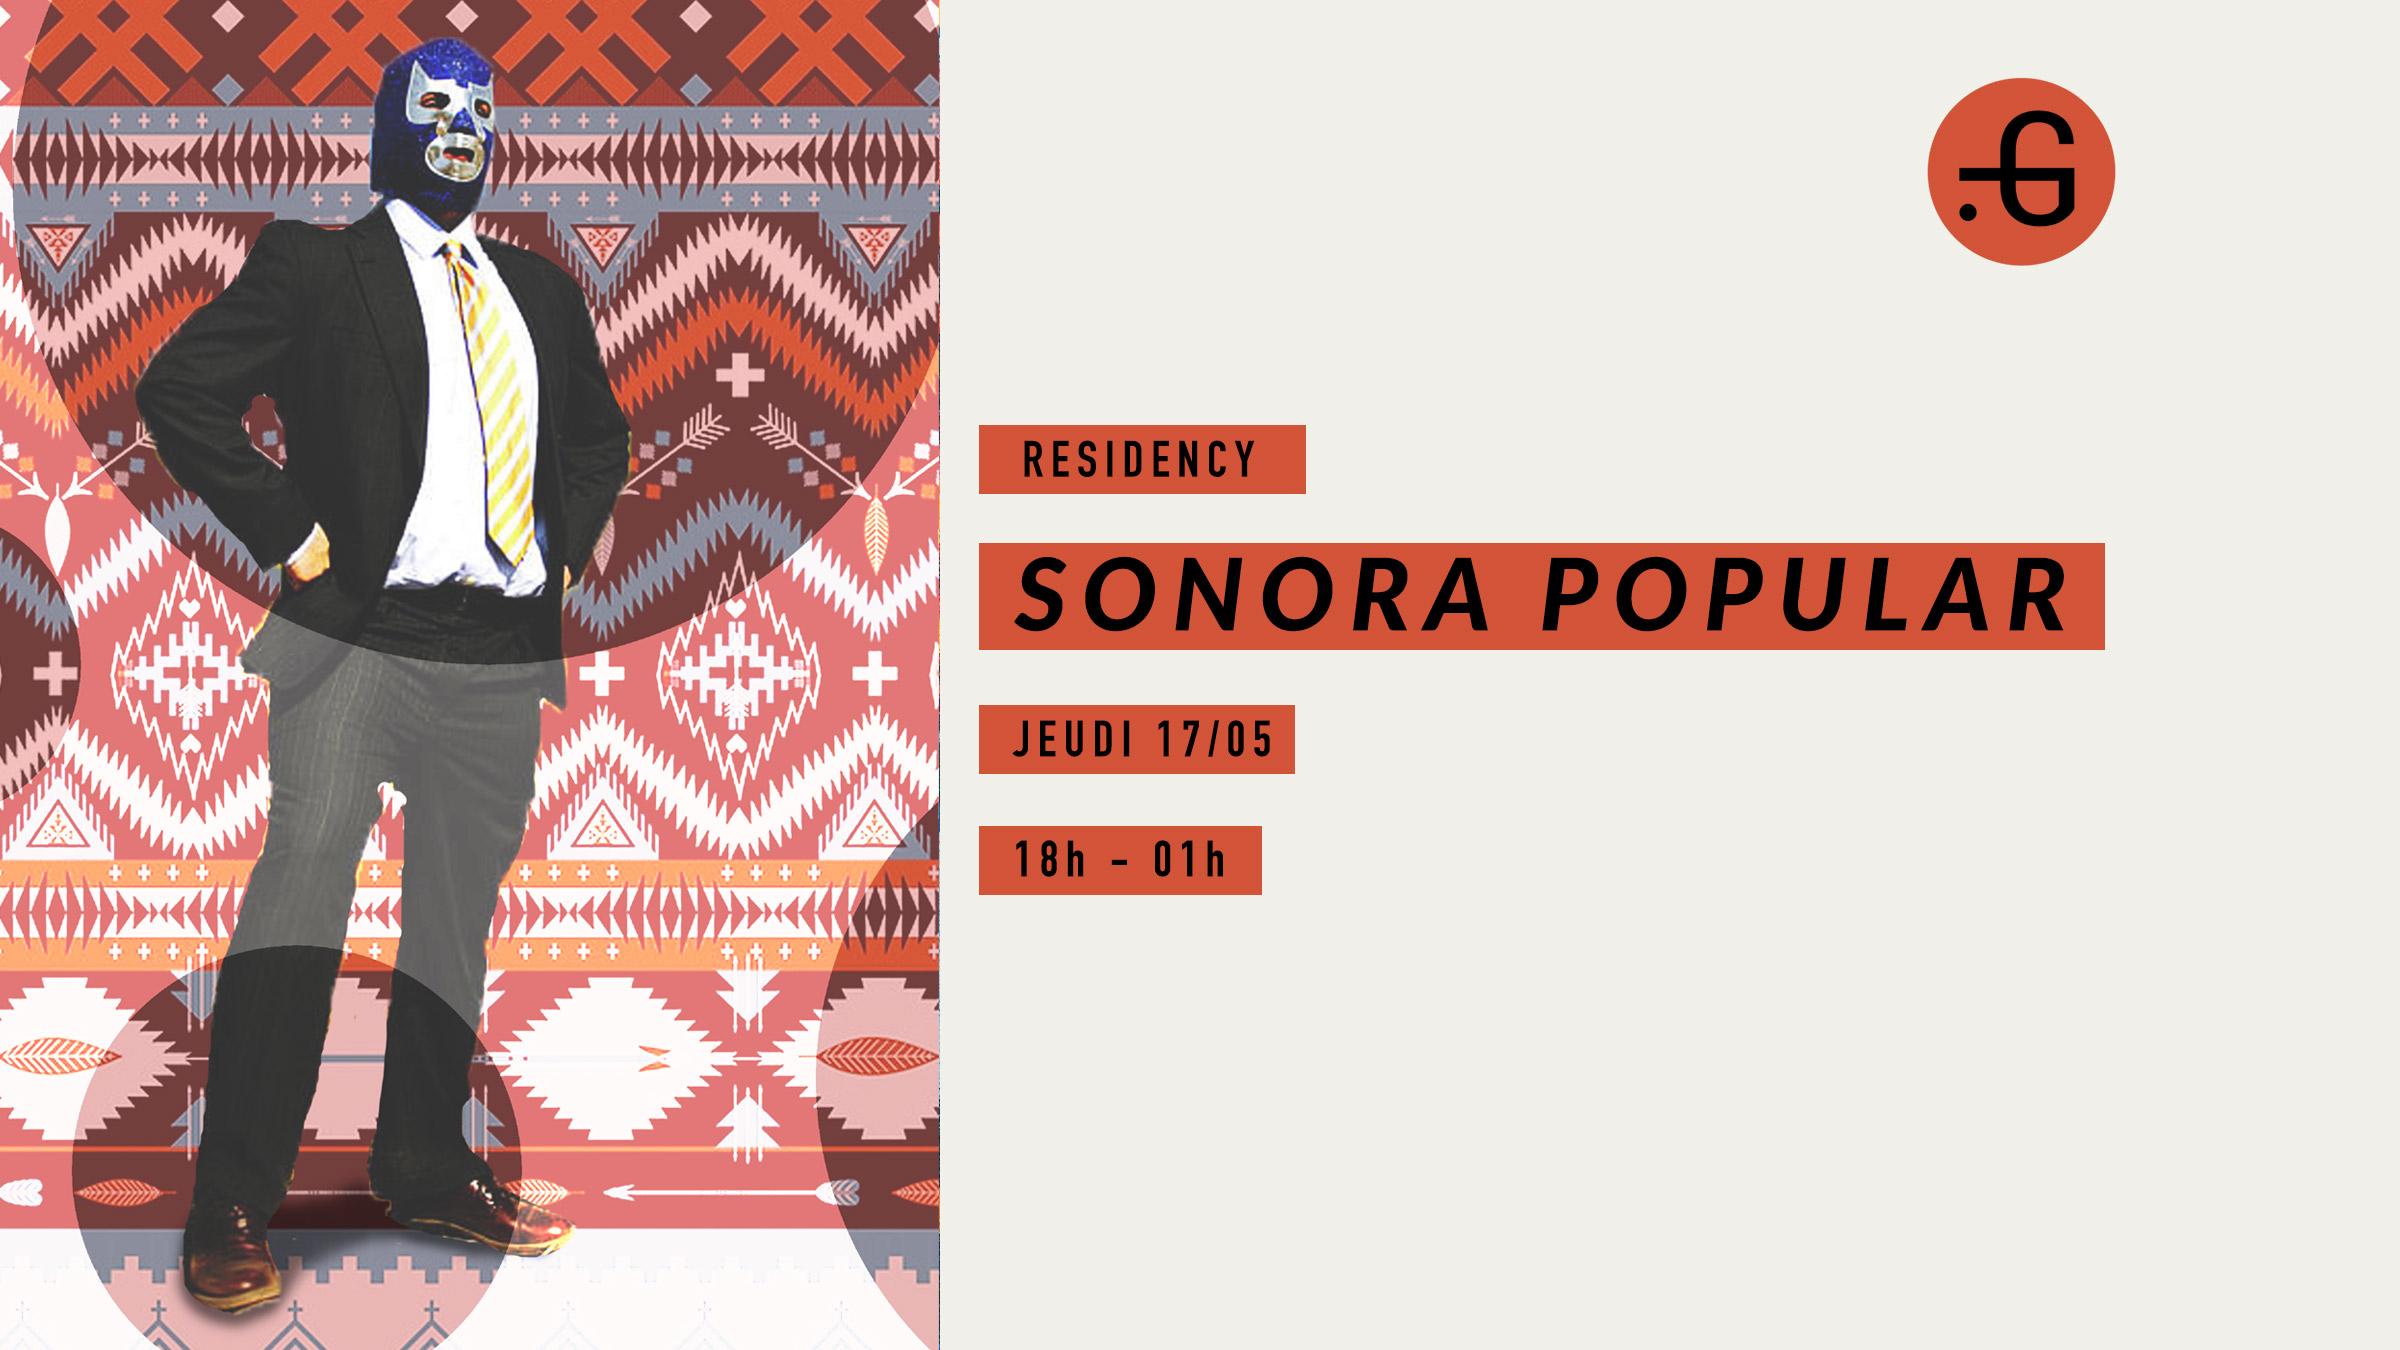 Sonora Popular, 17/05